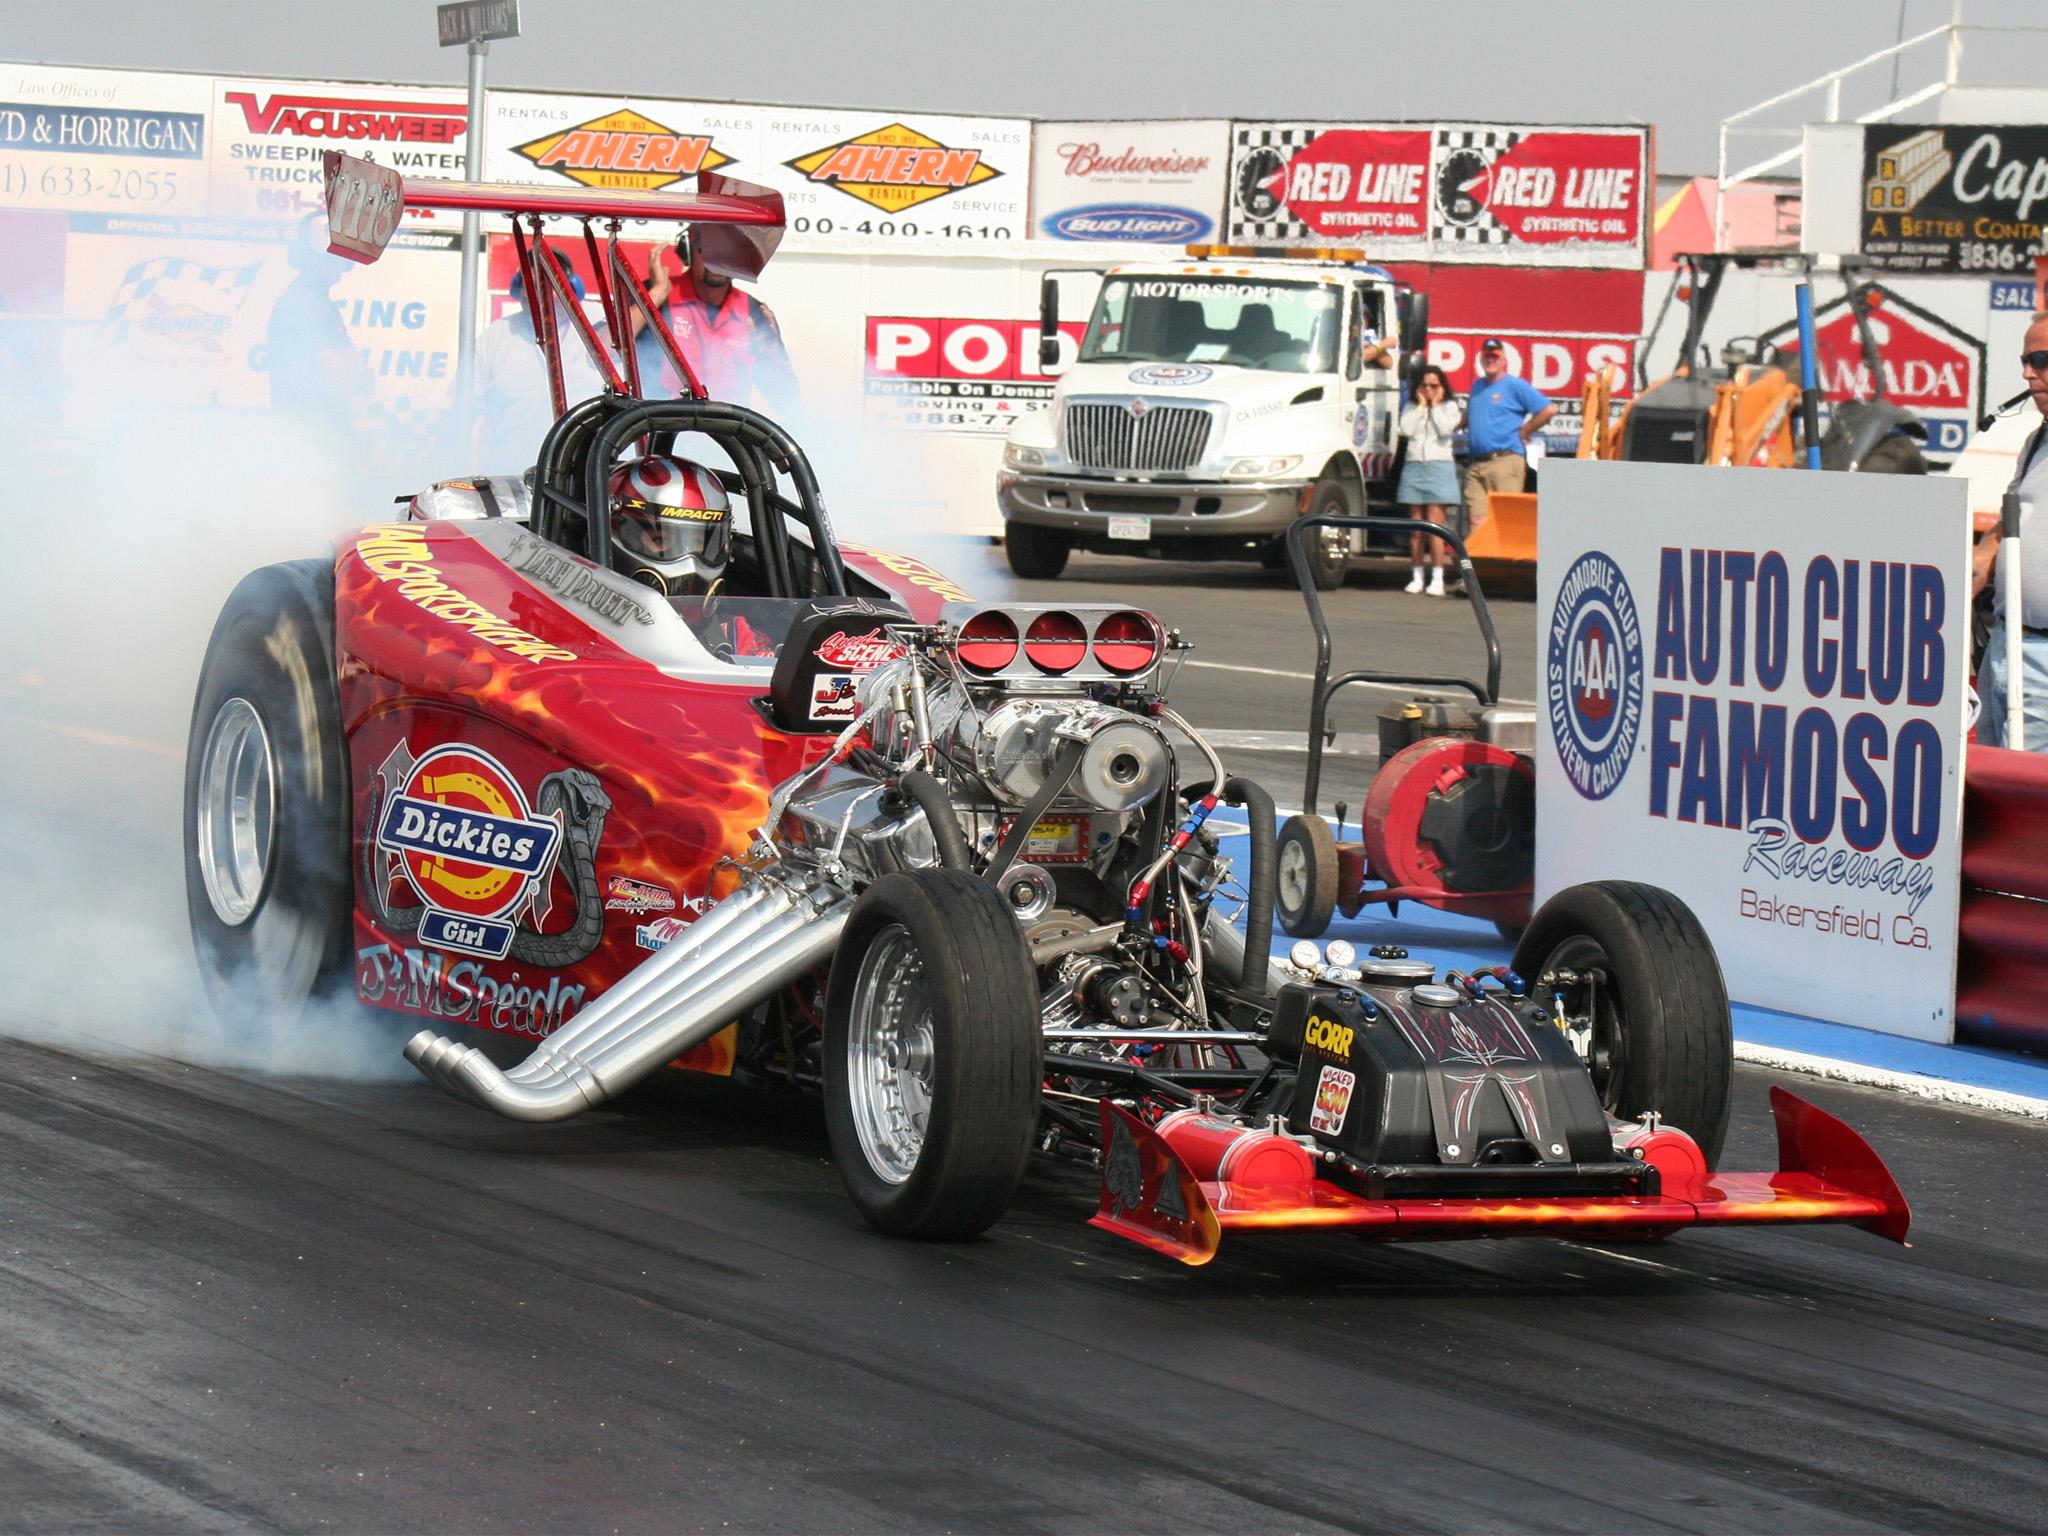 pics photos drag racing sports wallpaper